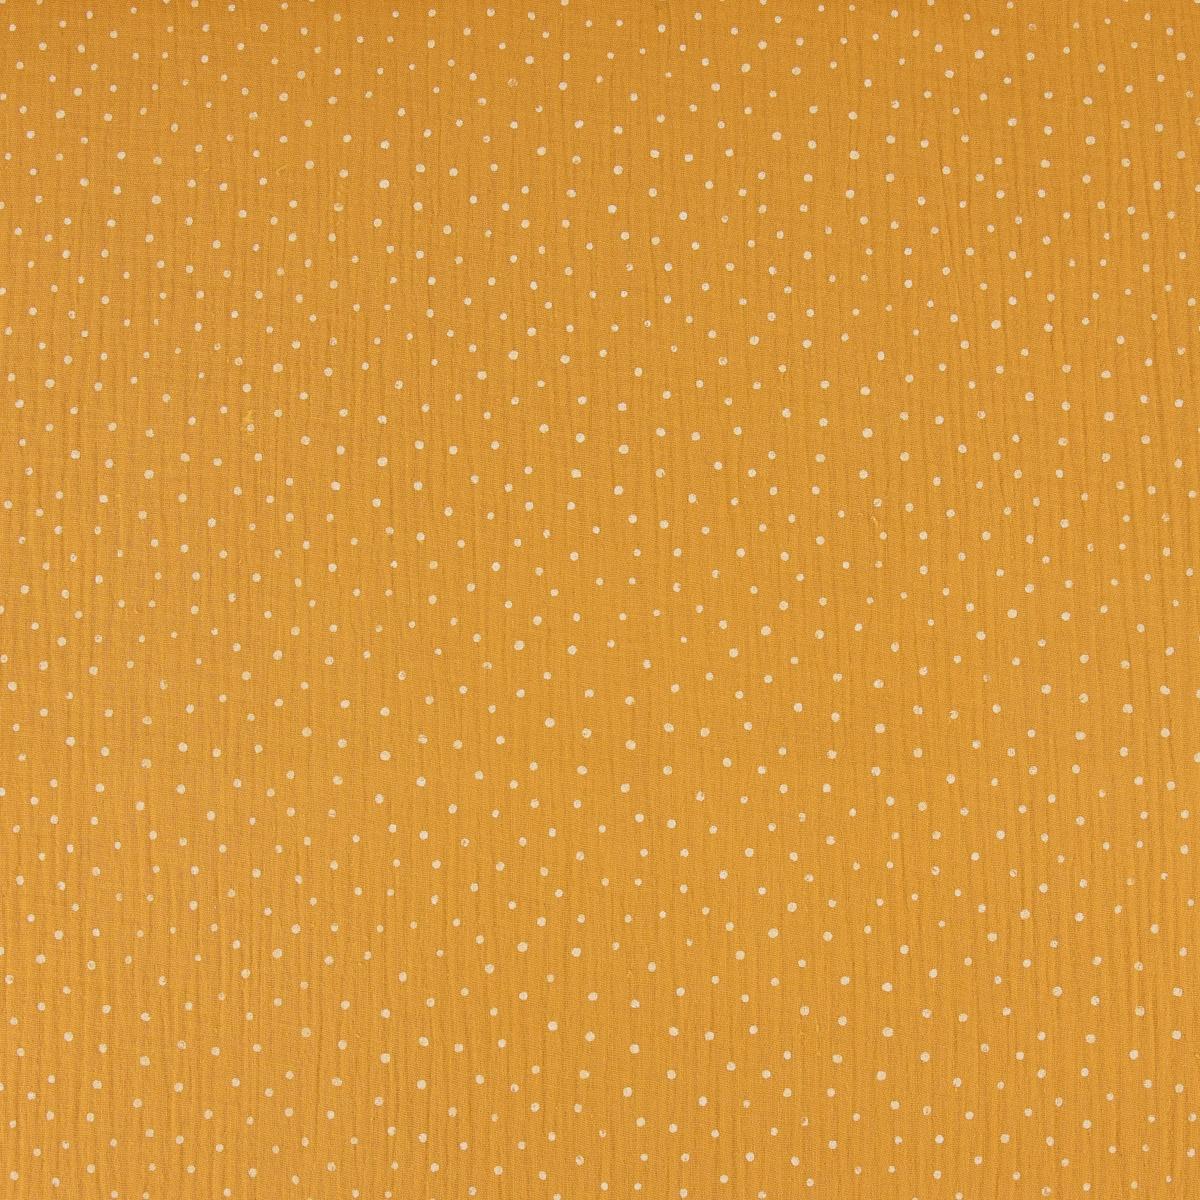 Bekleidungsstoff Double Gauze Musselin Punkte petrol gold 1,35m Breite